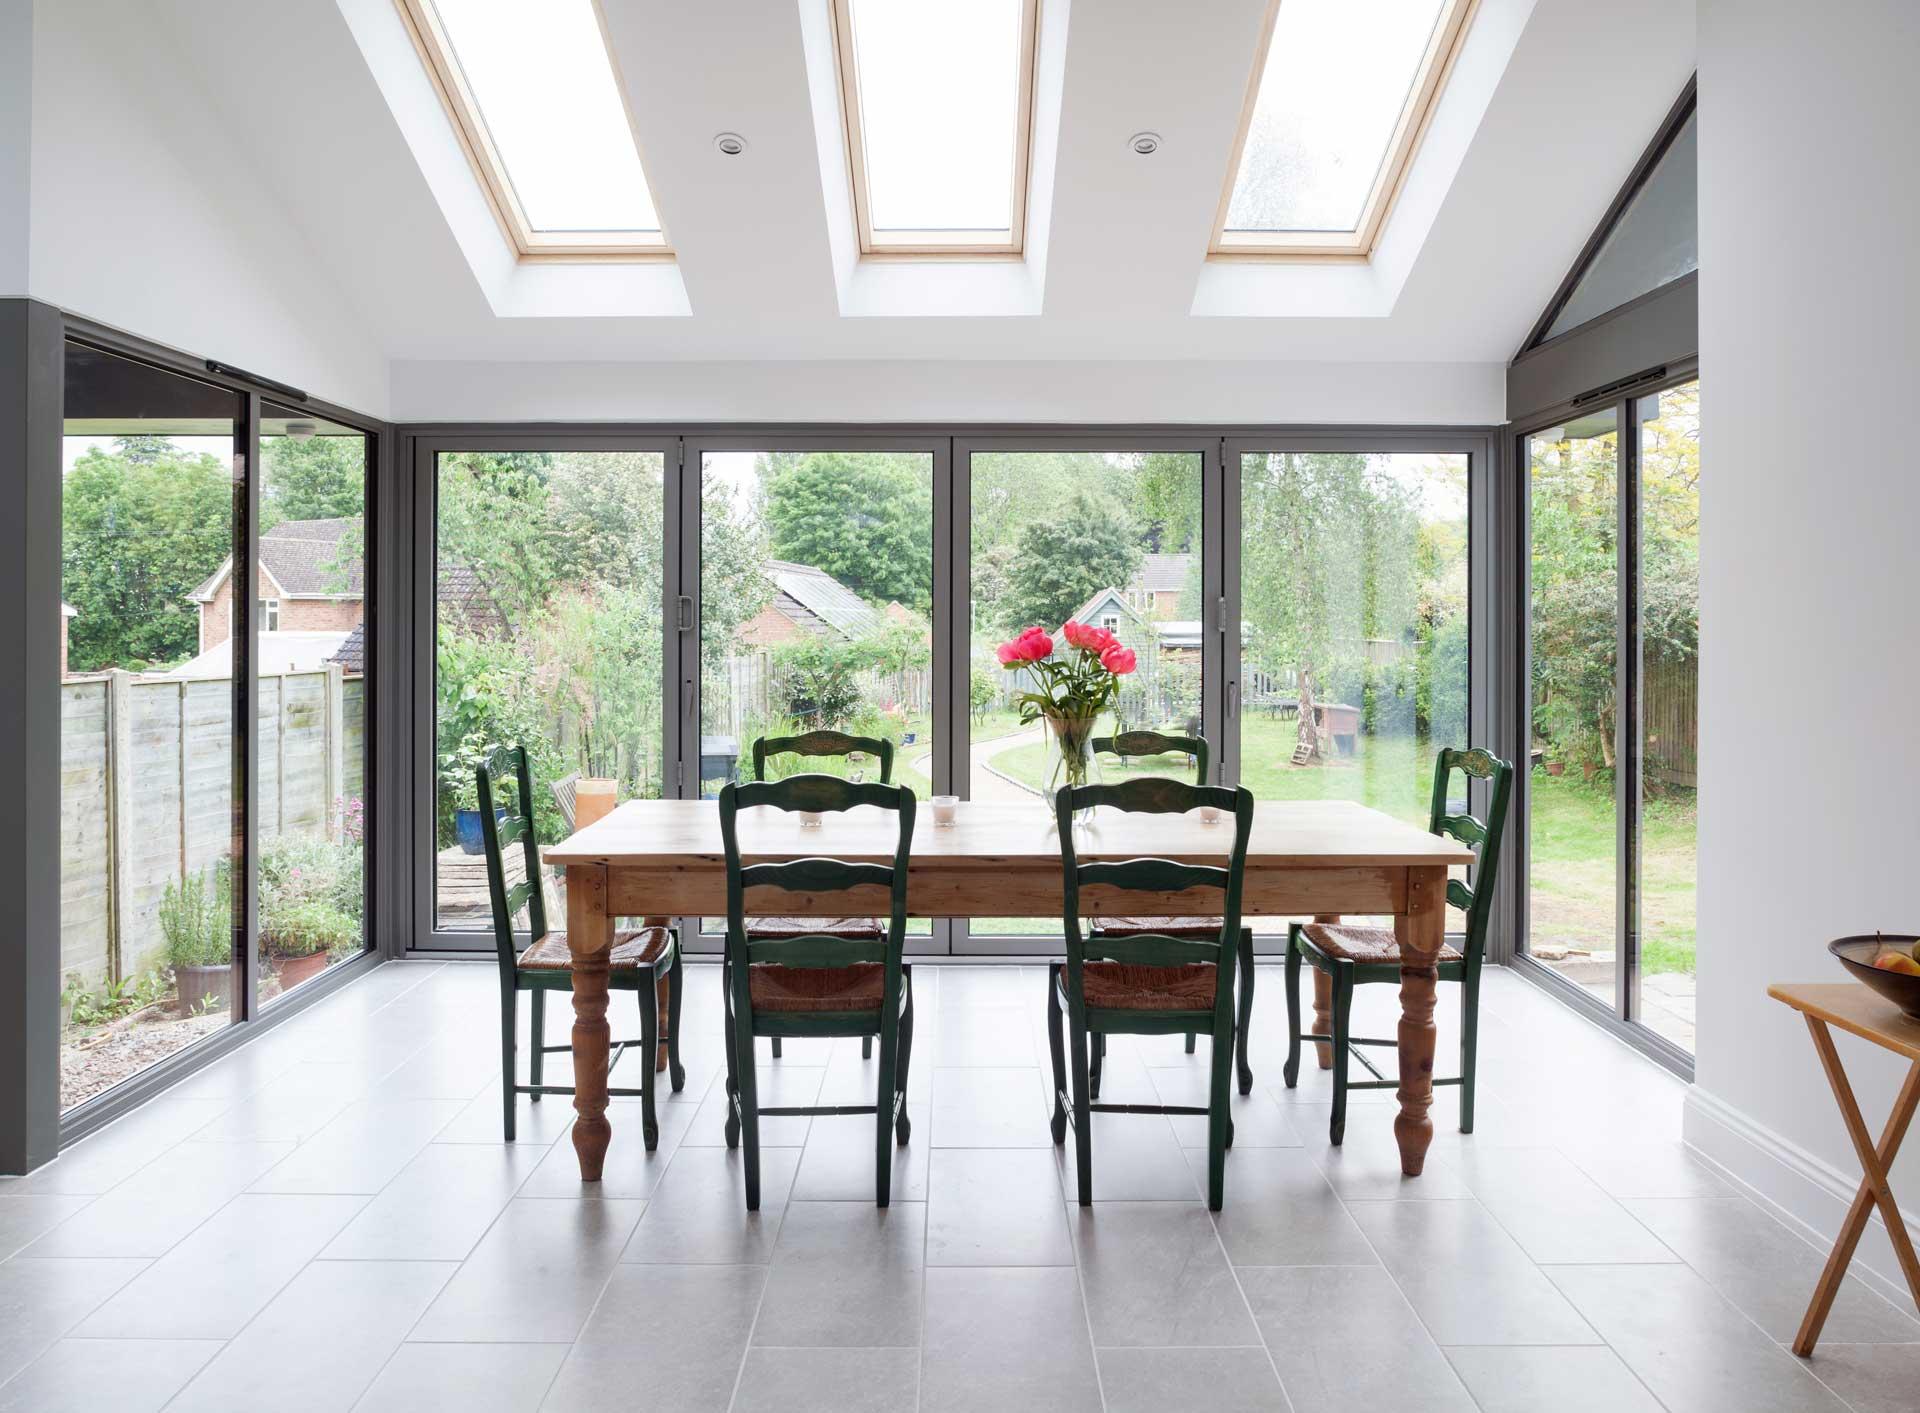 uPVC window replacement prices Market Weighton